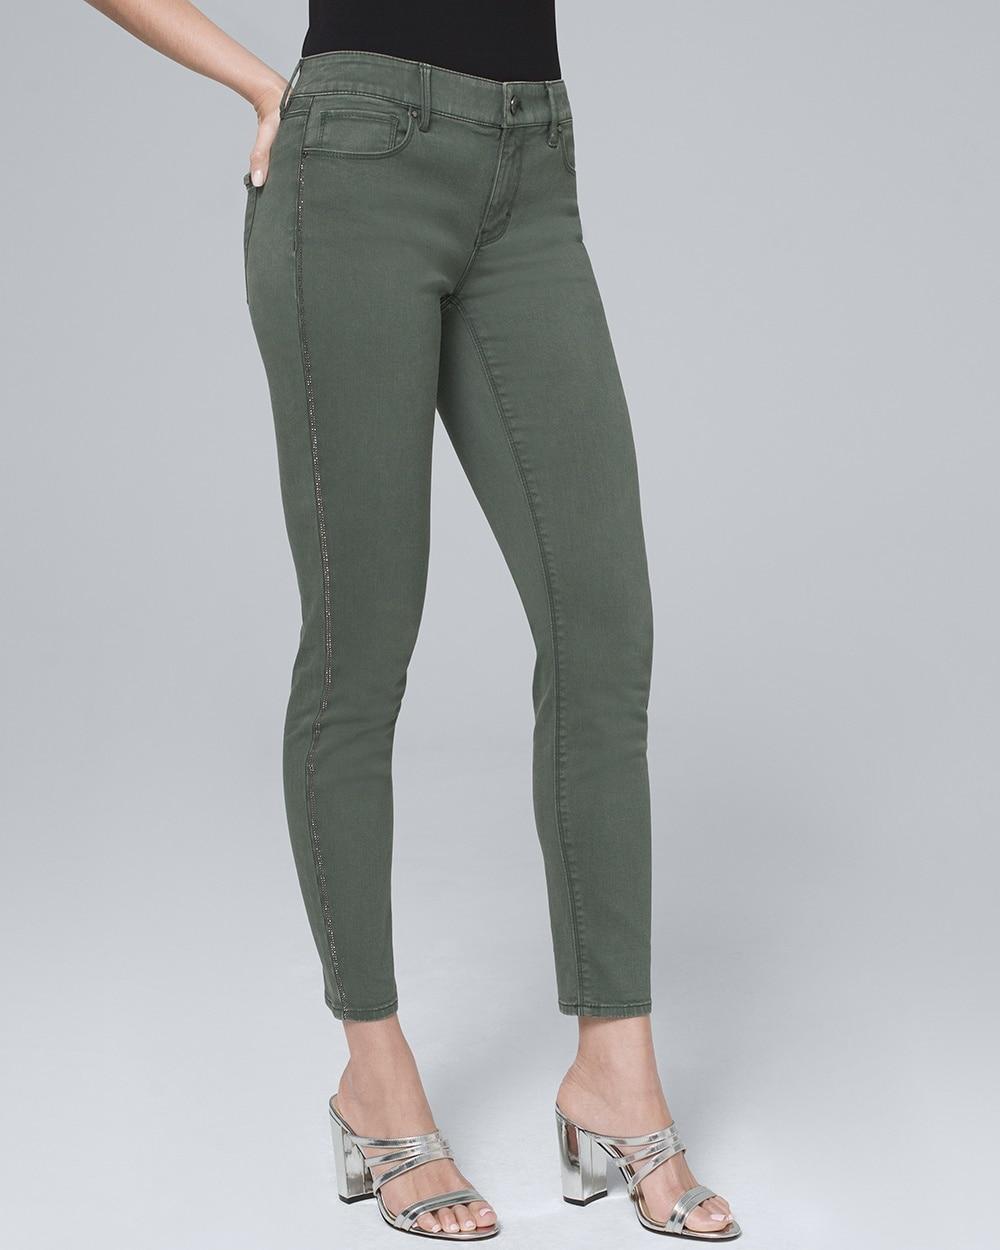 7b654f8ec51 Mid-Rise Embellished-Stripe Cropped Jeans - White House Black Market